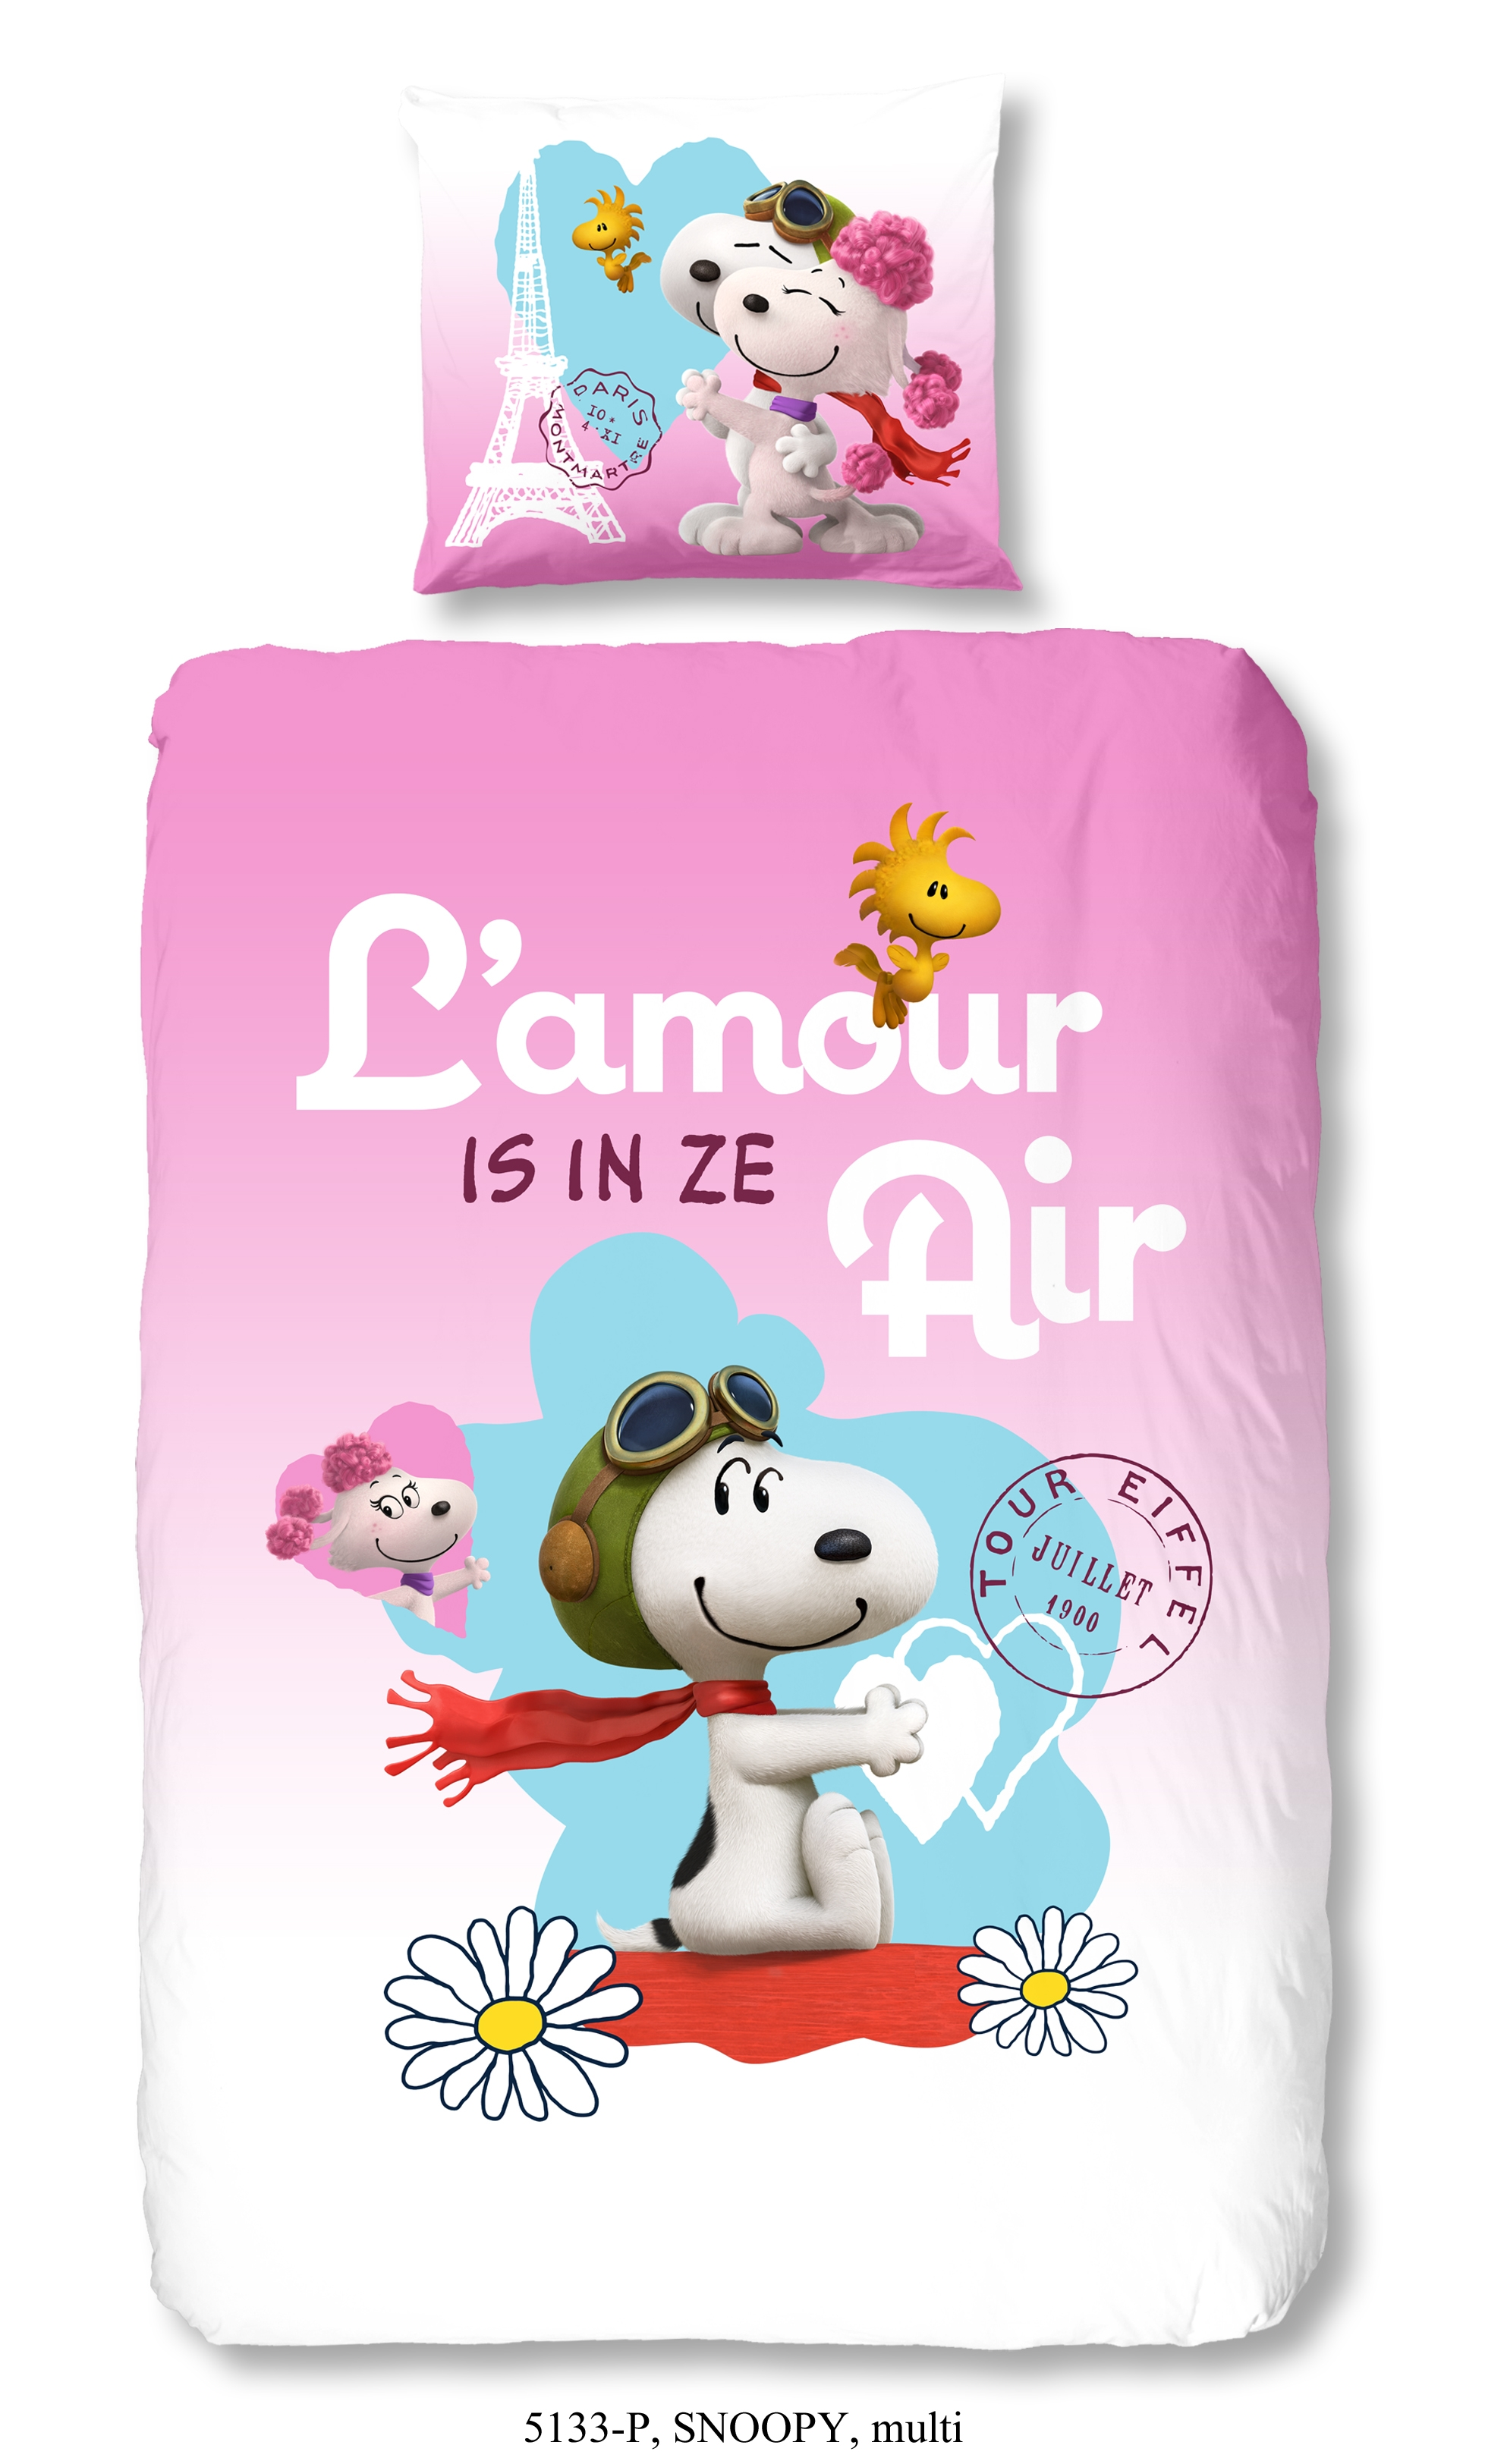 Snoopy Dekbedovertrek L'Amour